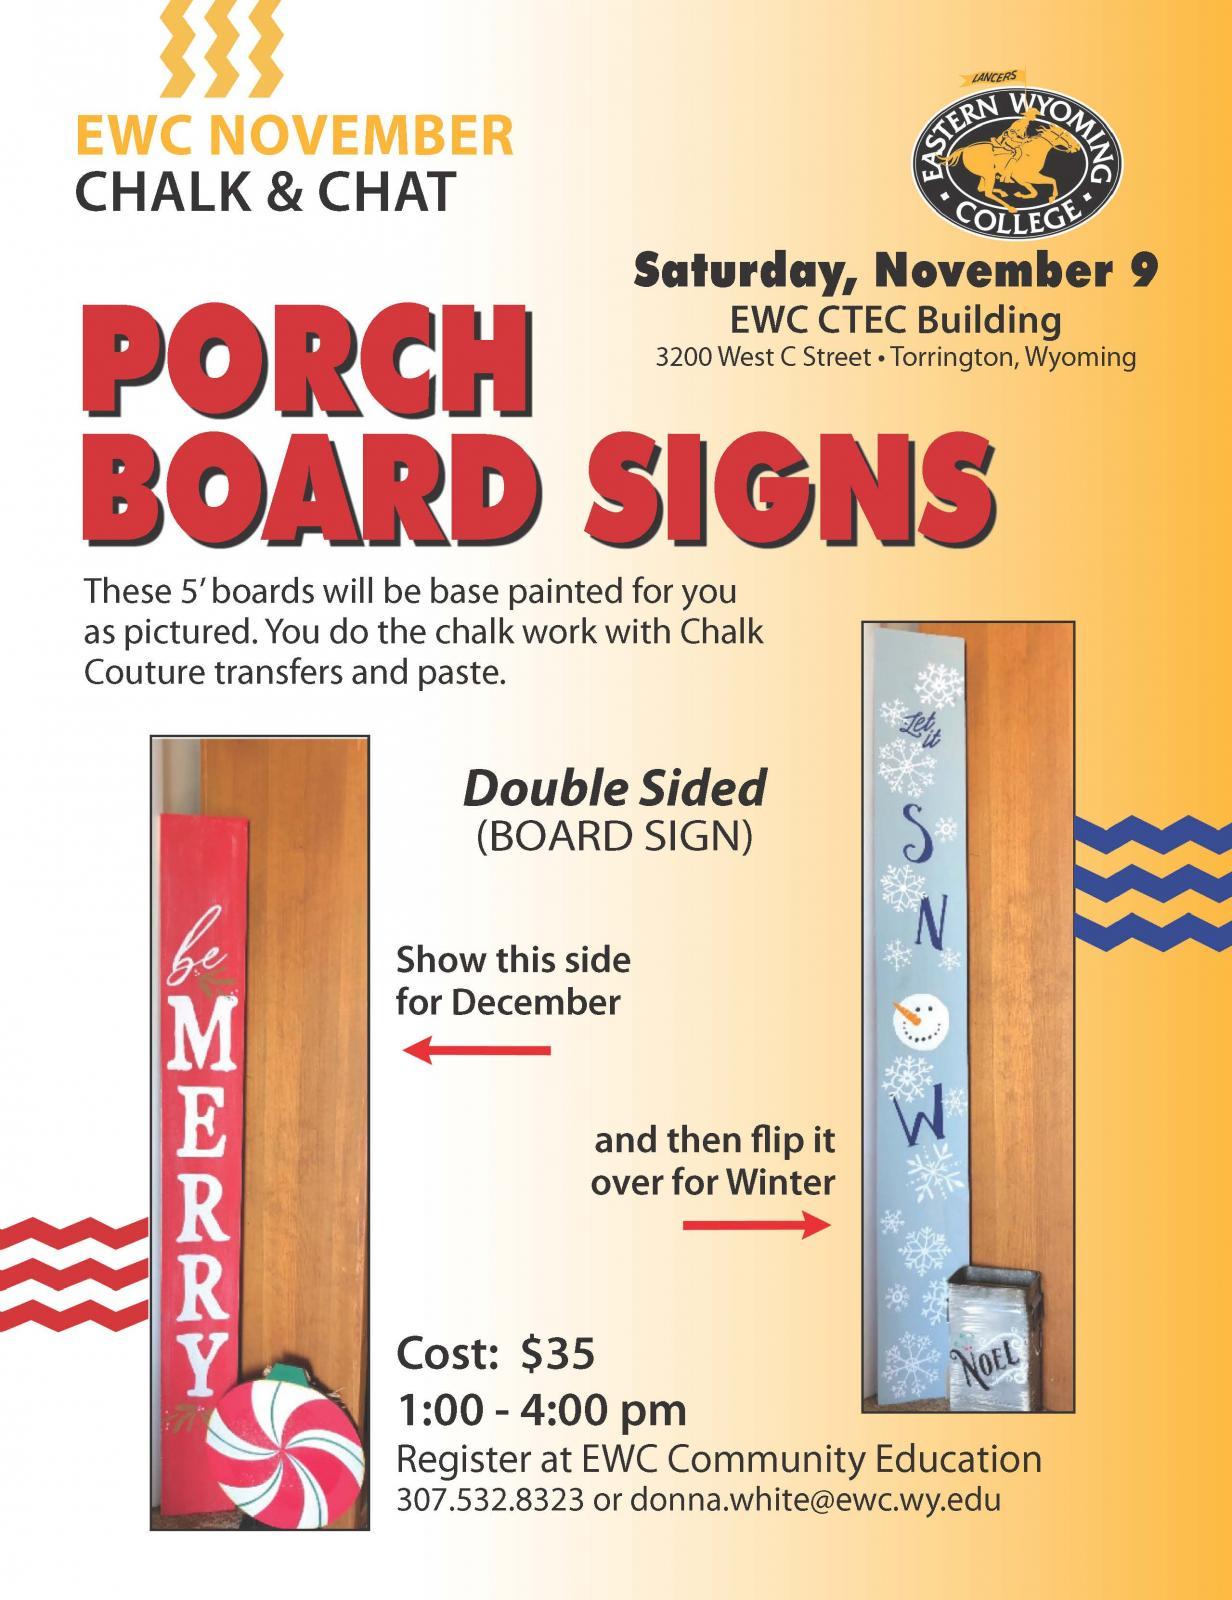 Porch Board Signs Class at EWC Photo